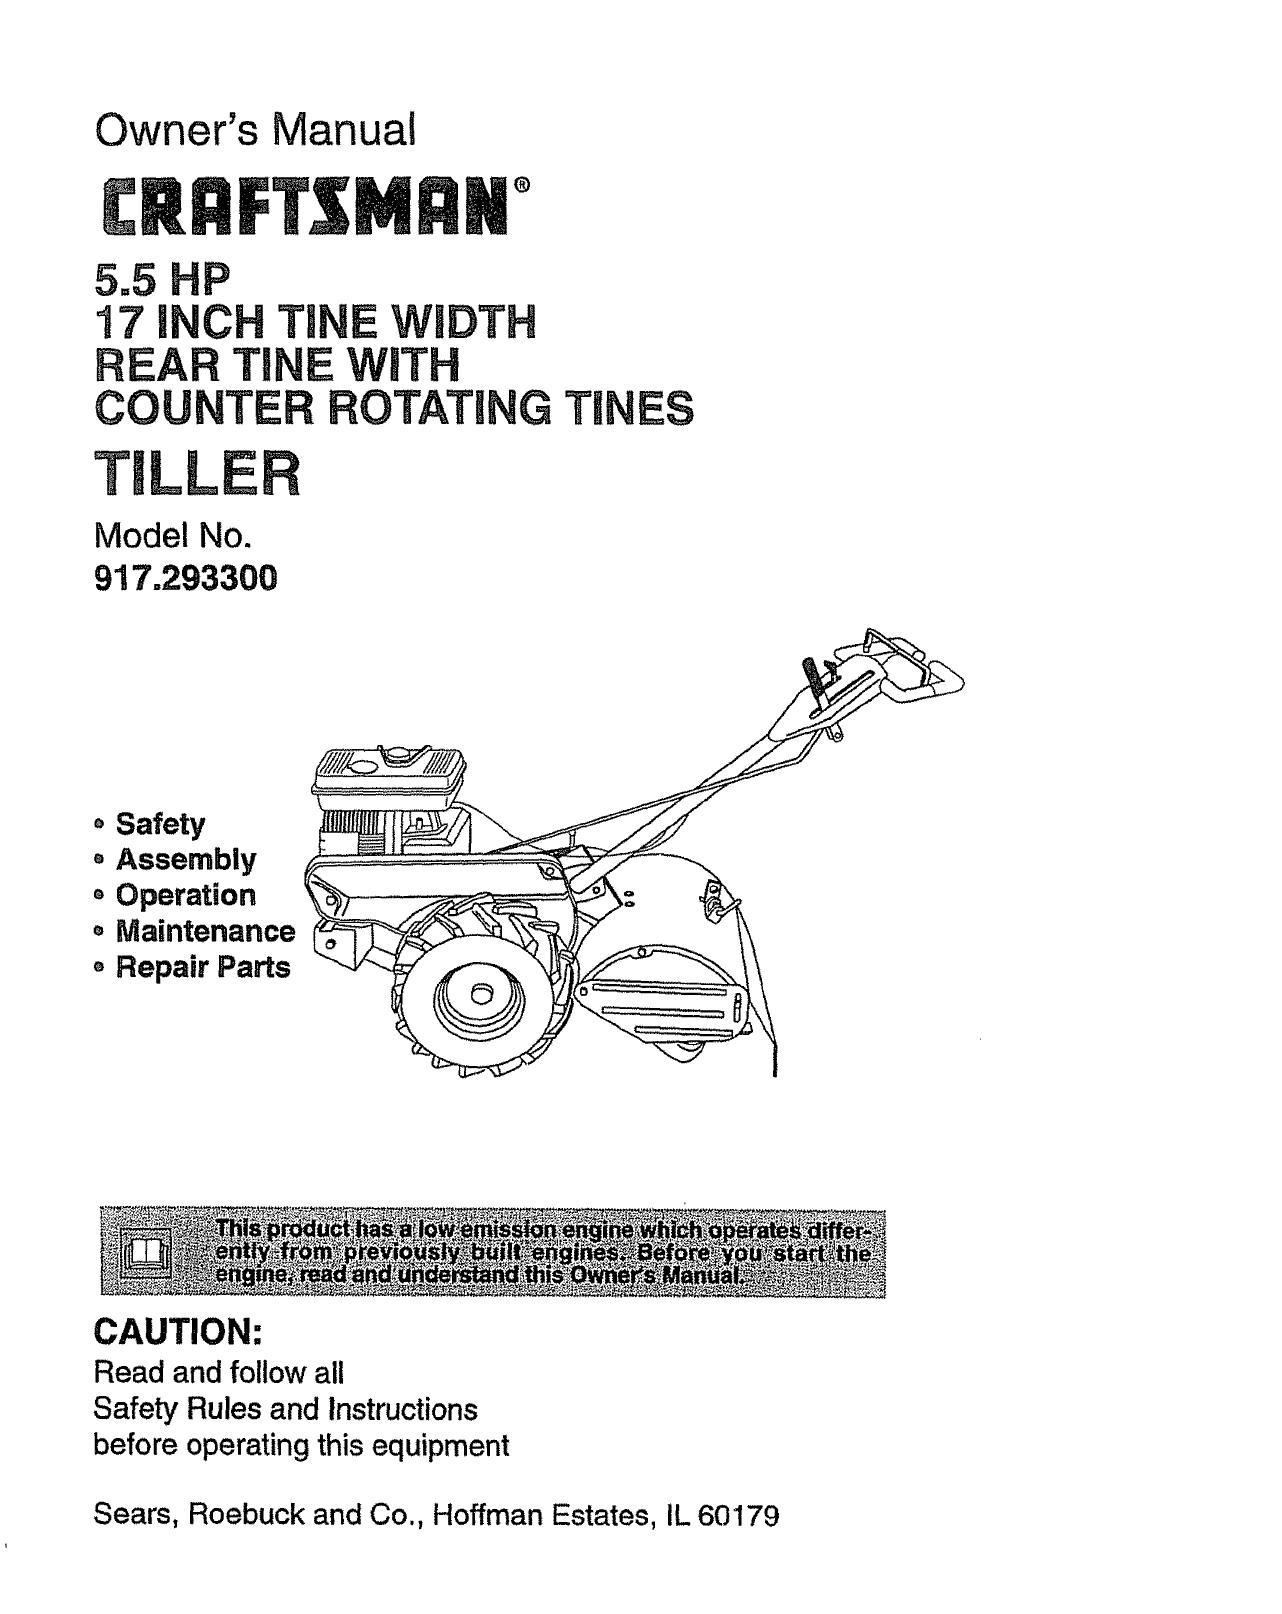 Craftsman 917 2933 Users Manual